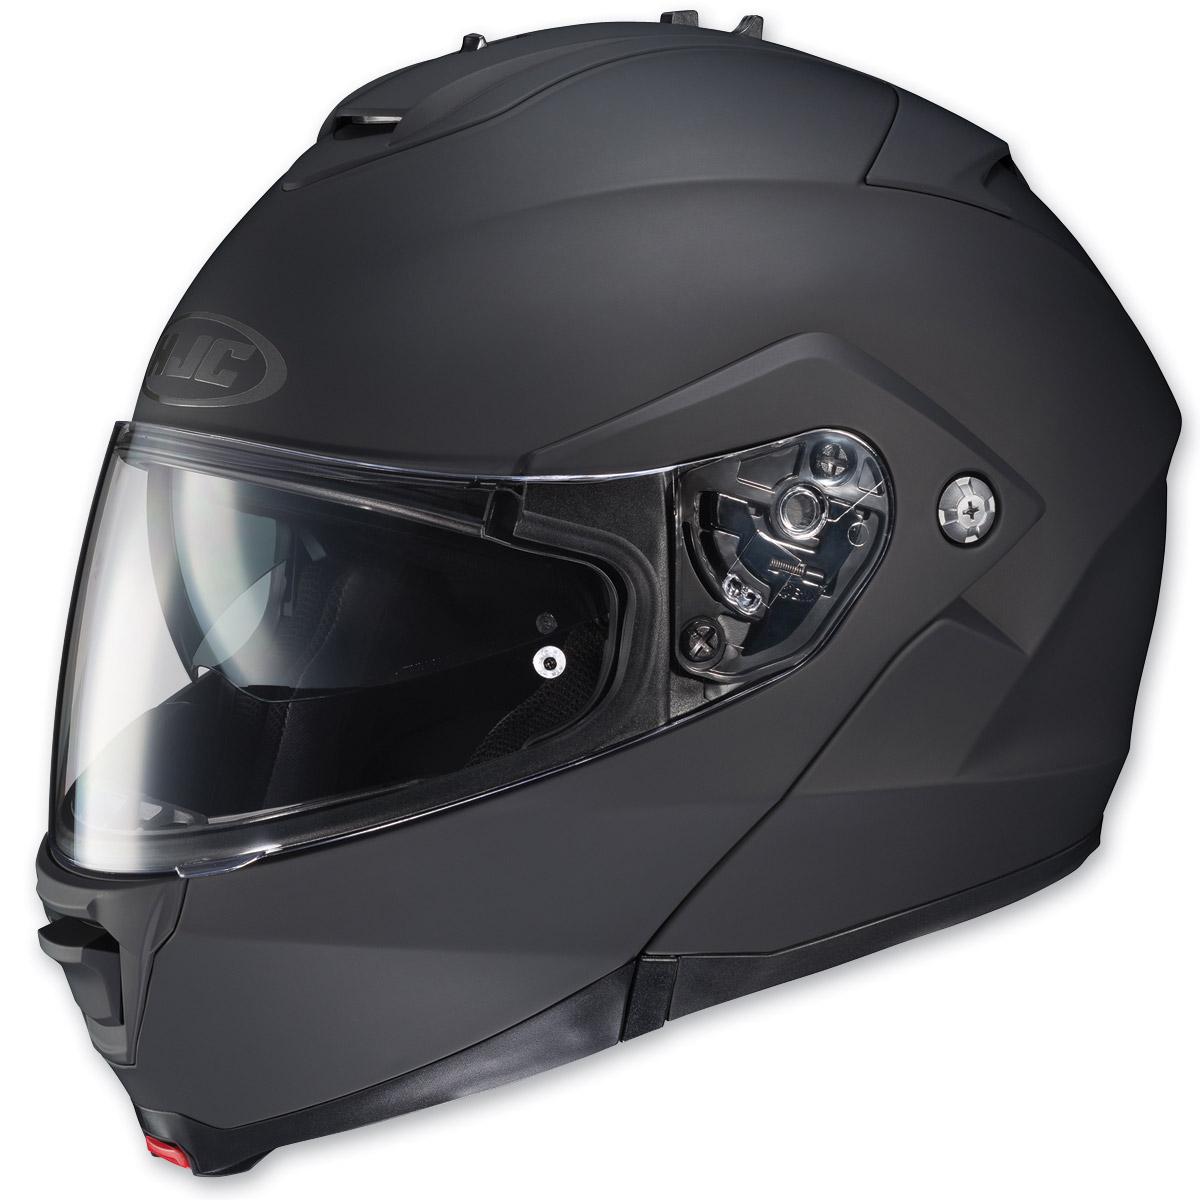 02fdc9ac HJC IS-MAX II Matte Black Modular Helmet - 980-612 | JPCycles.com